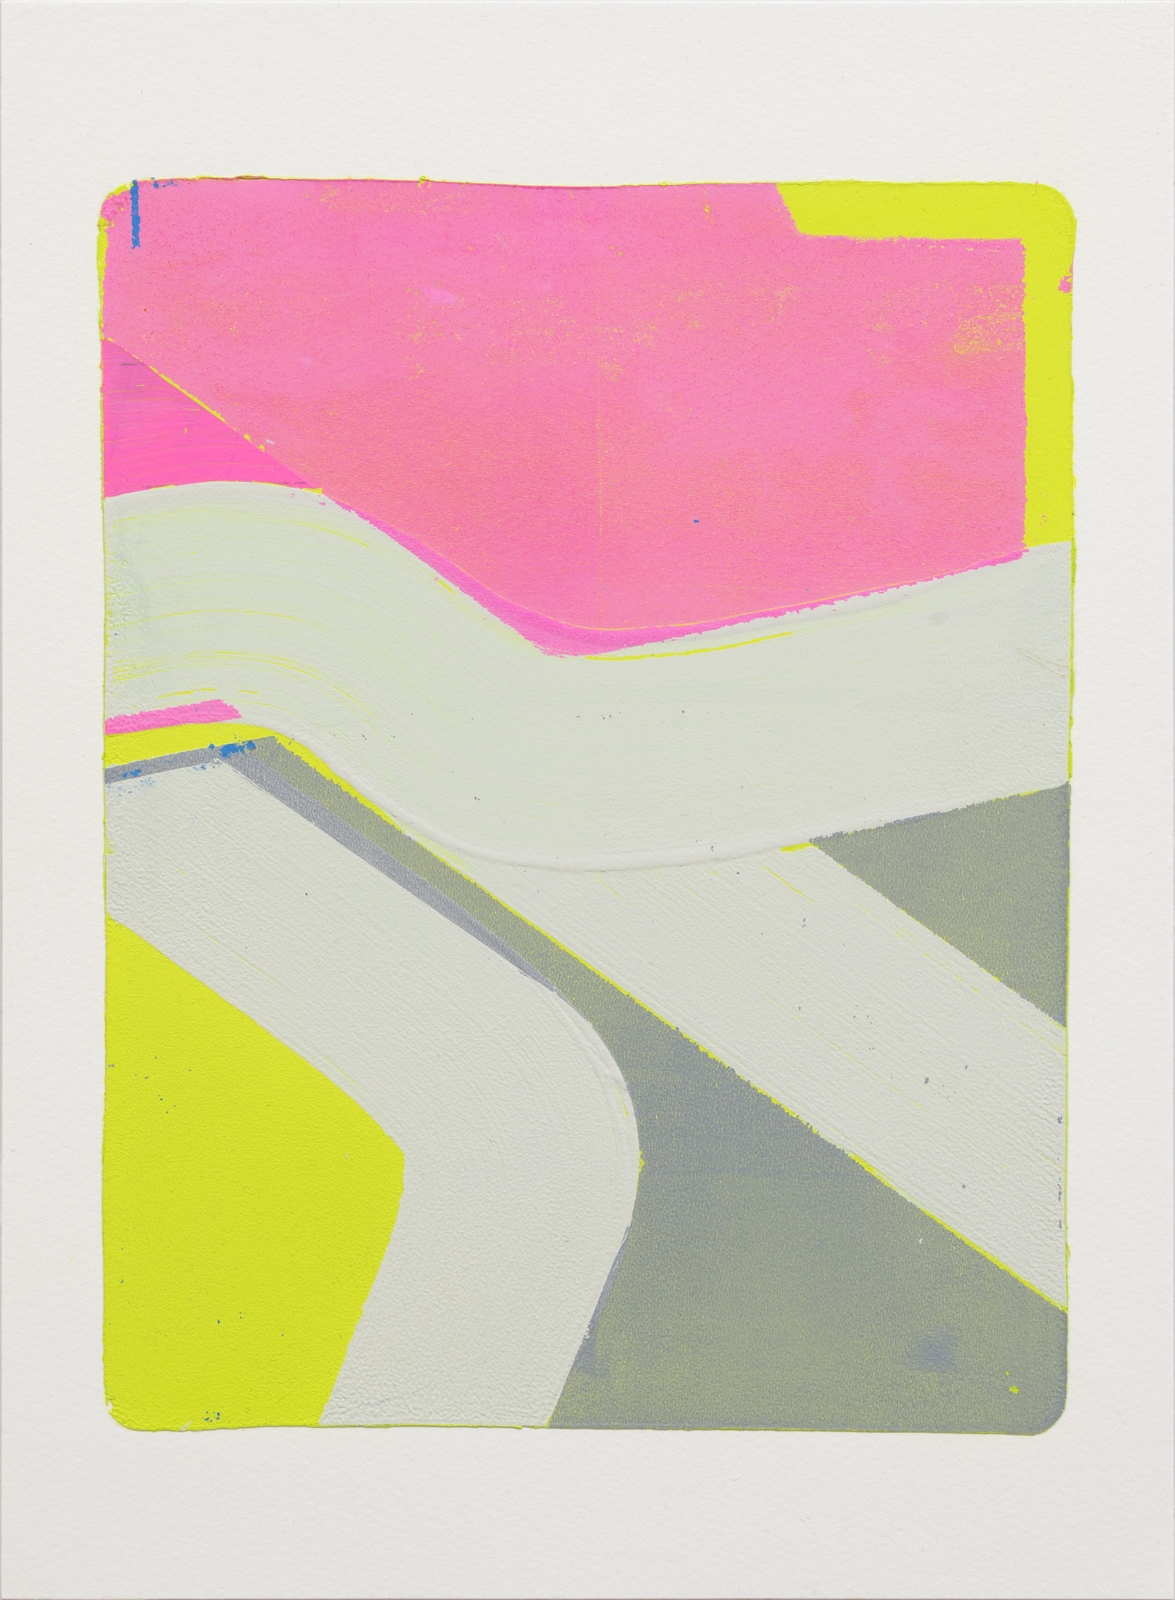 Untitled, 2019 Monotype paper 3 - kazuhirohigashi | ello